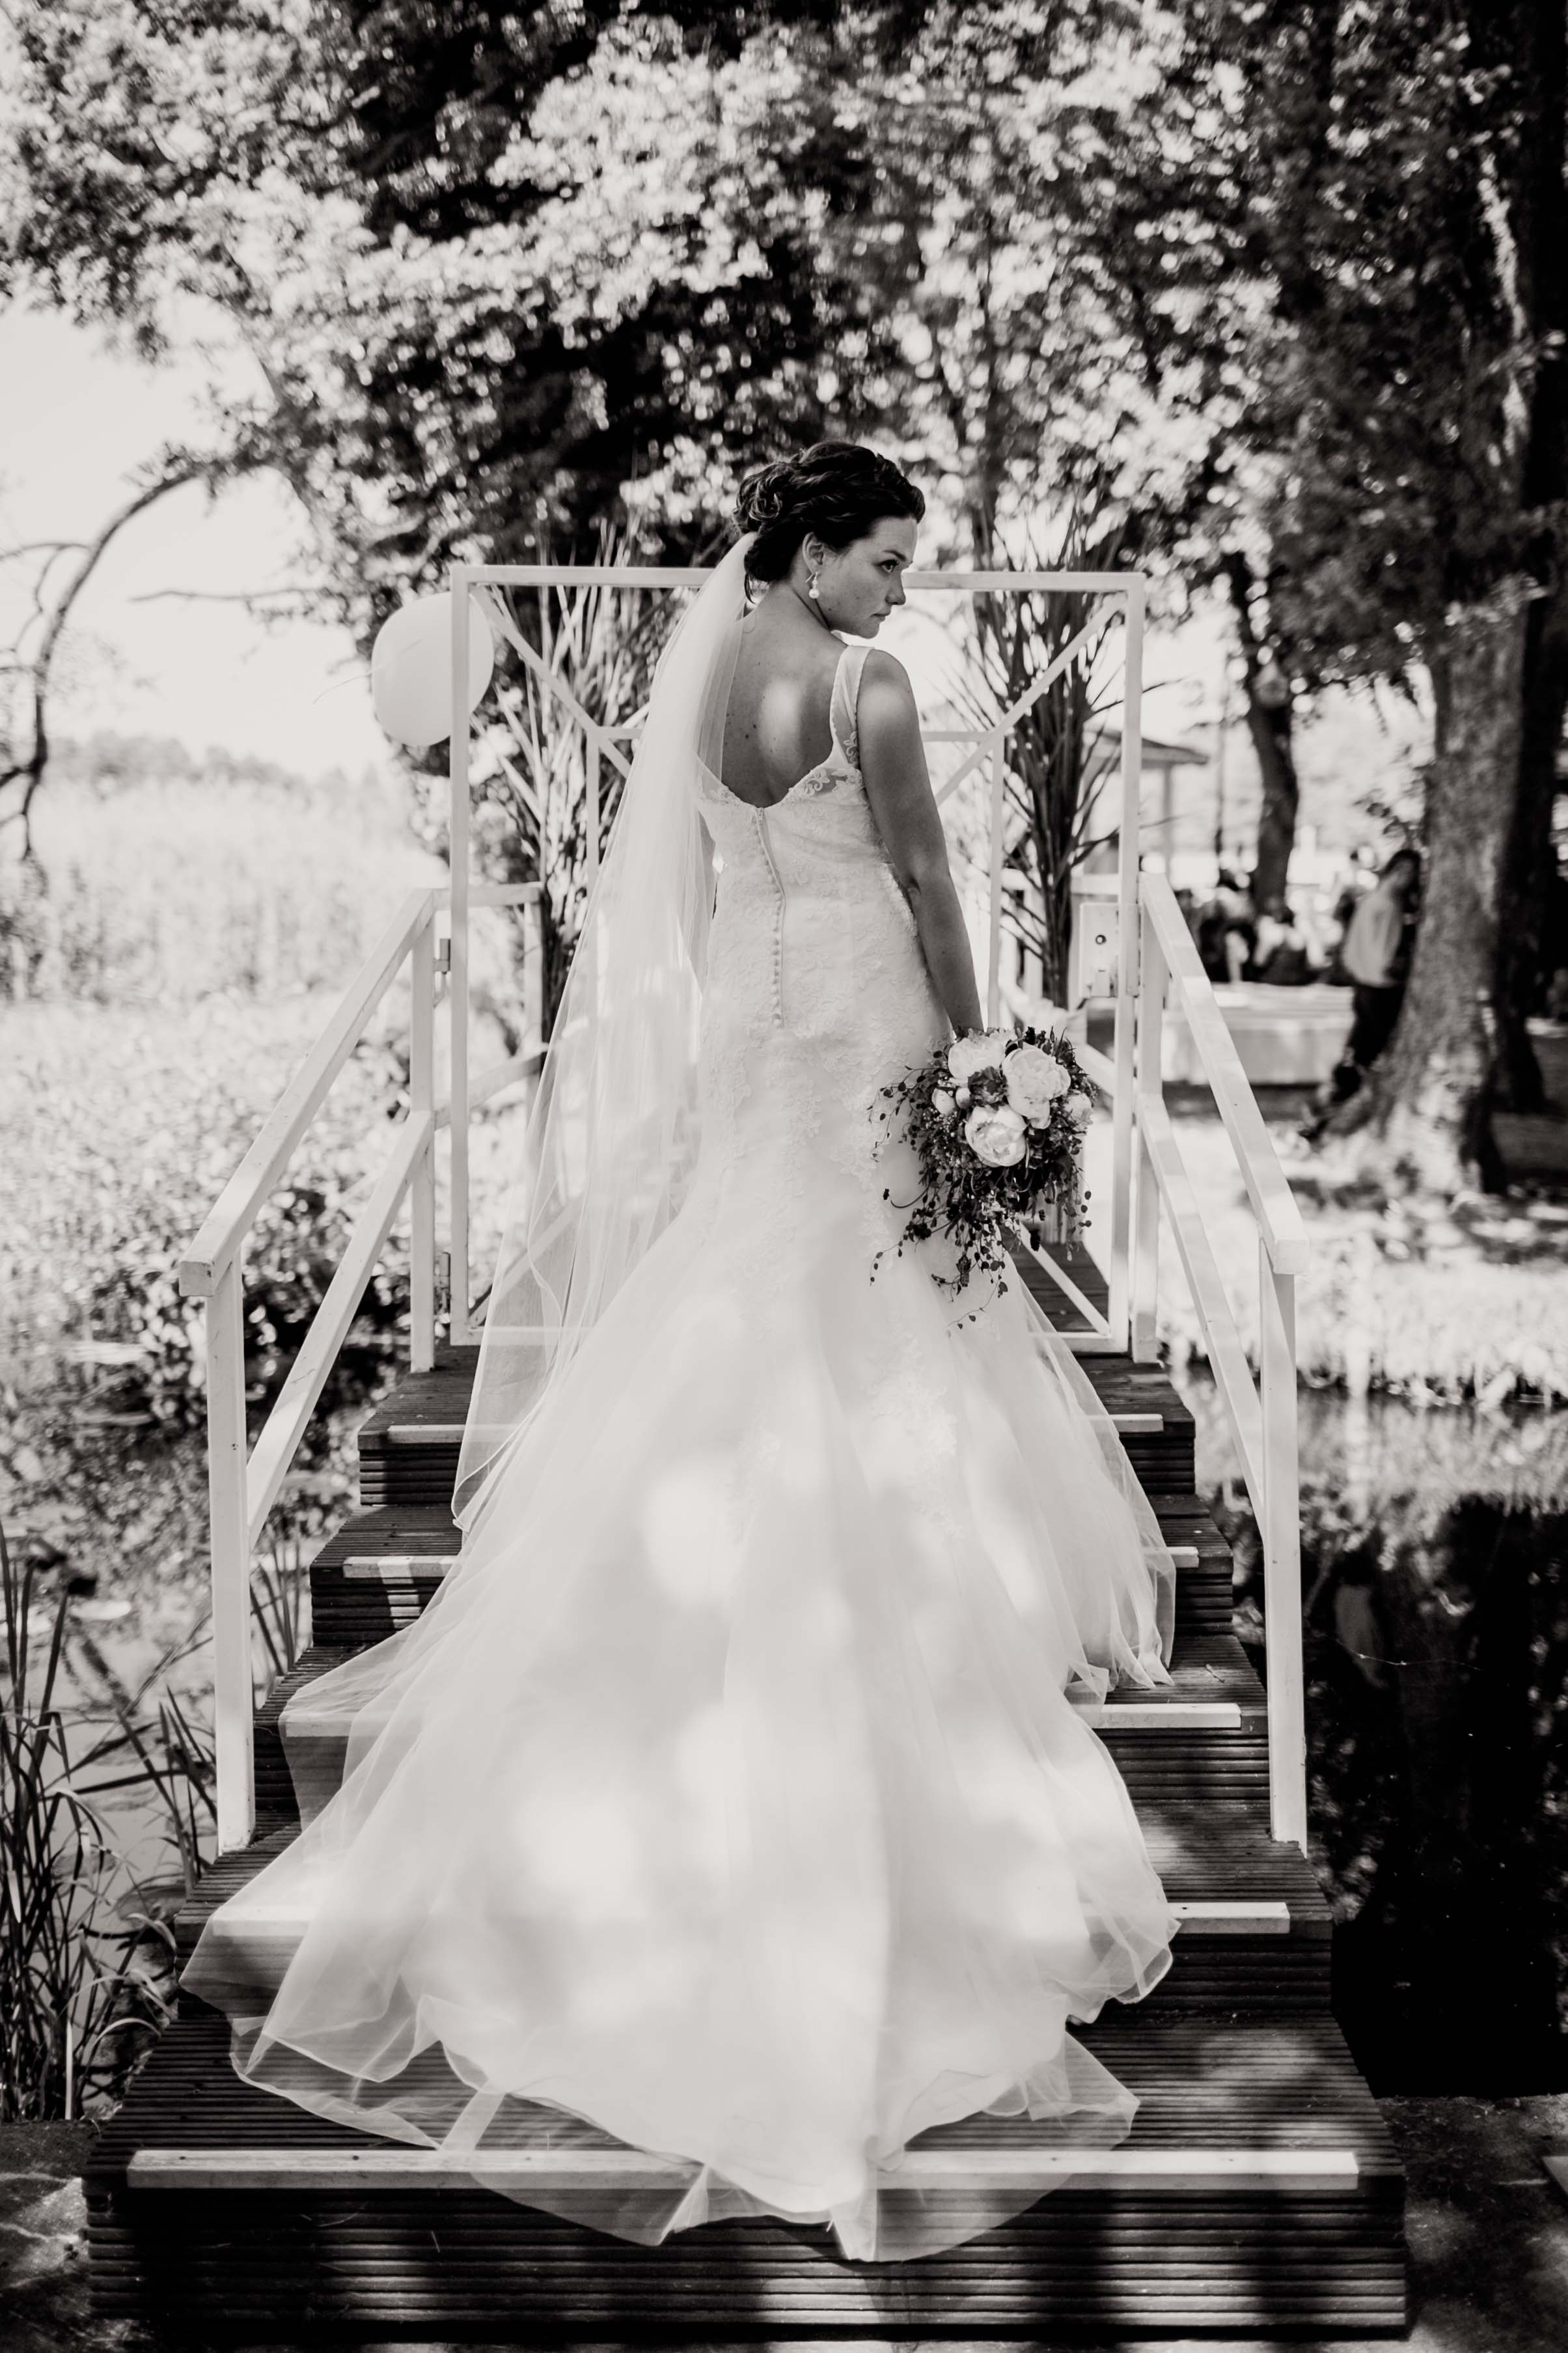 Hochzeitsfotografie Berlin_Fran Burrows Fotografie-205.jpg